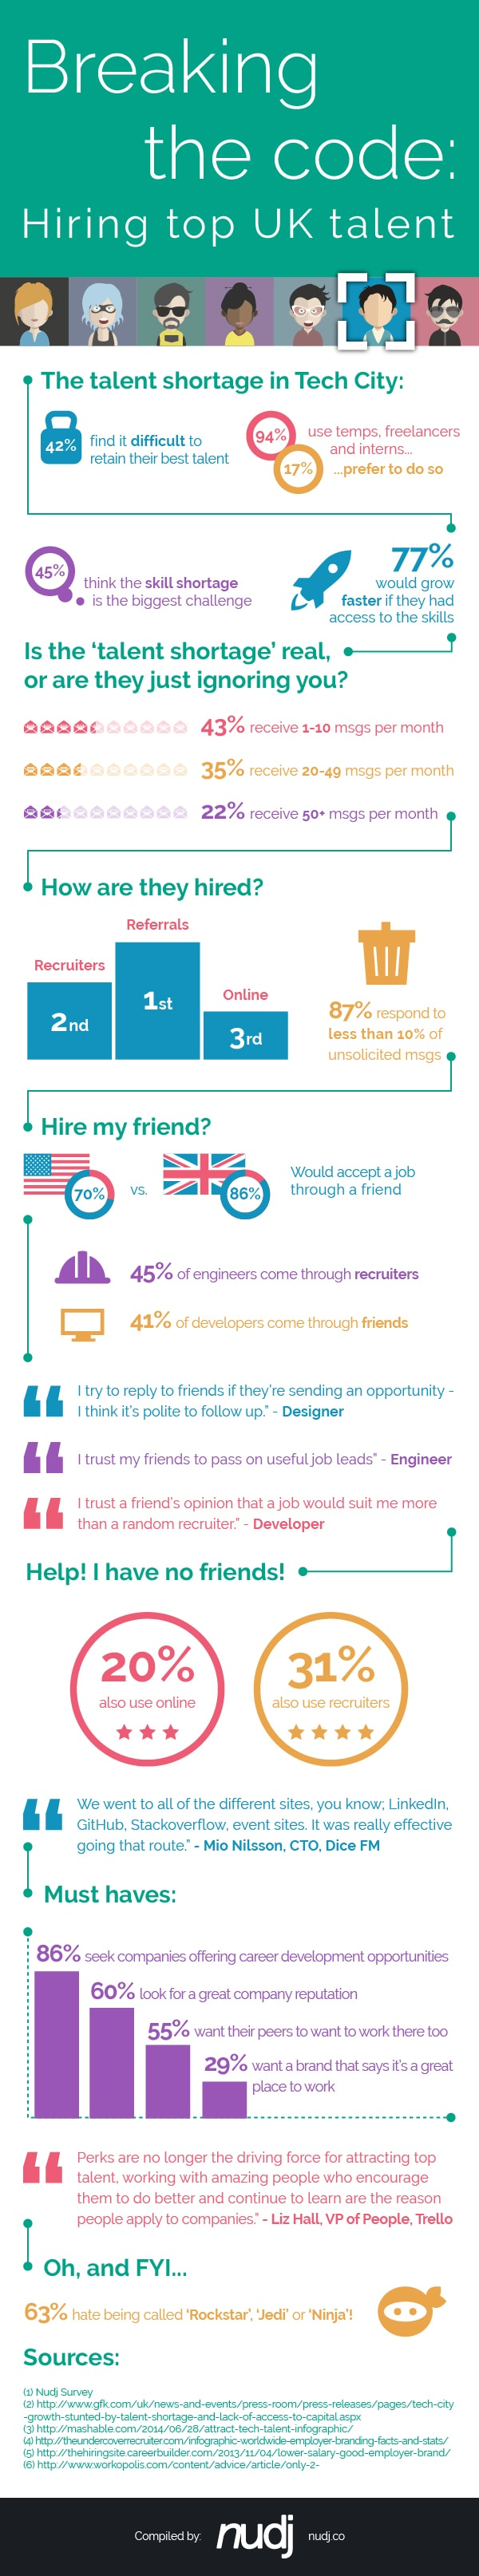 nudj_breaking_the_code_infographic (1)